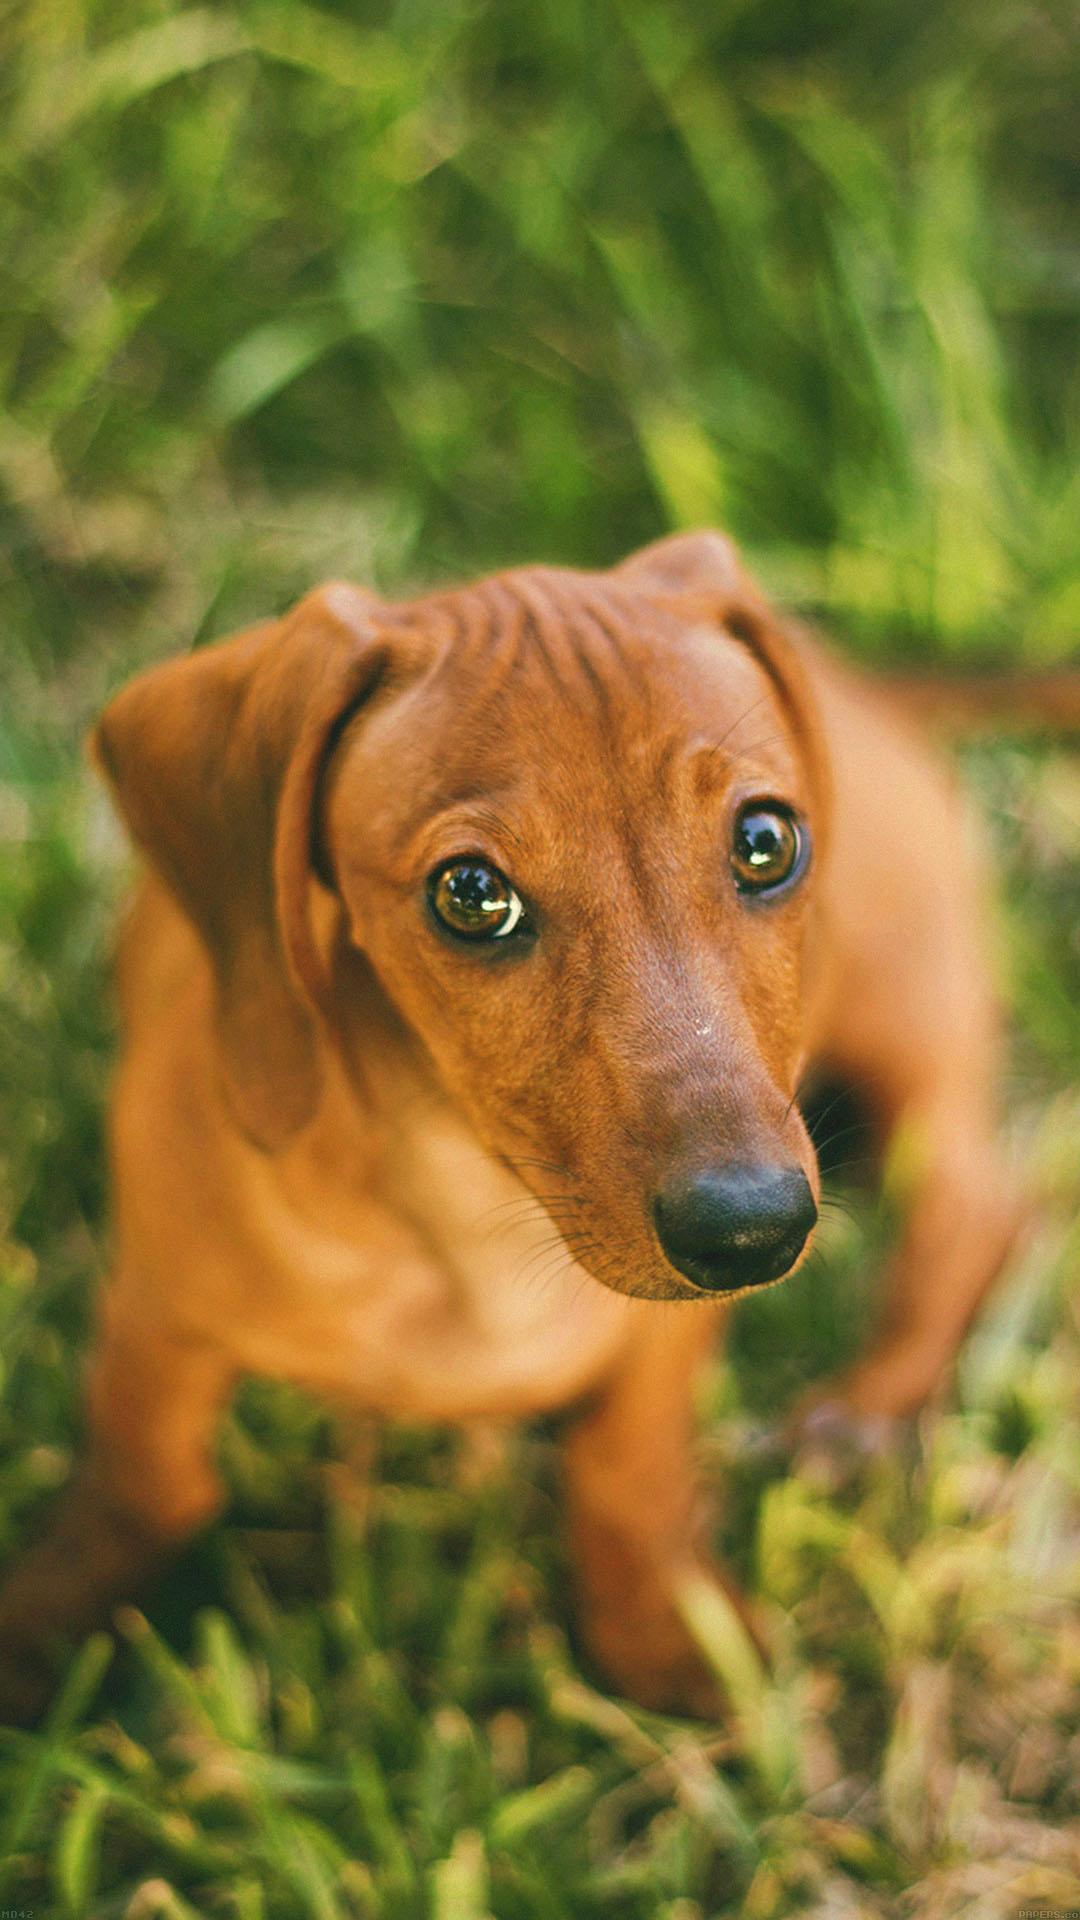 Wallpaper Dog Looking Up Animal